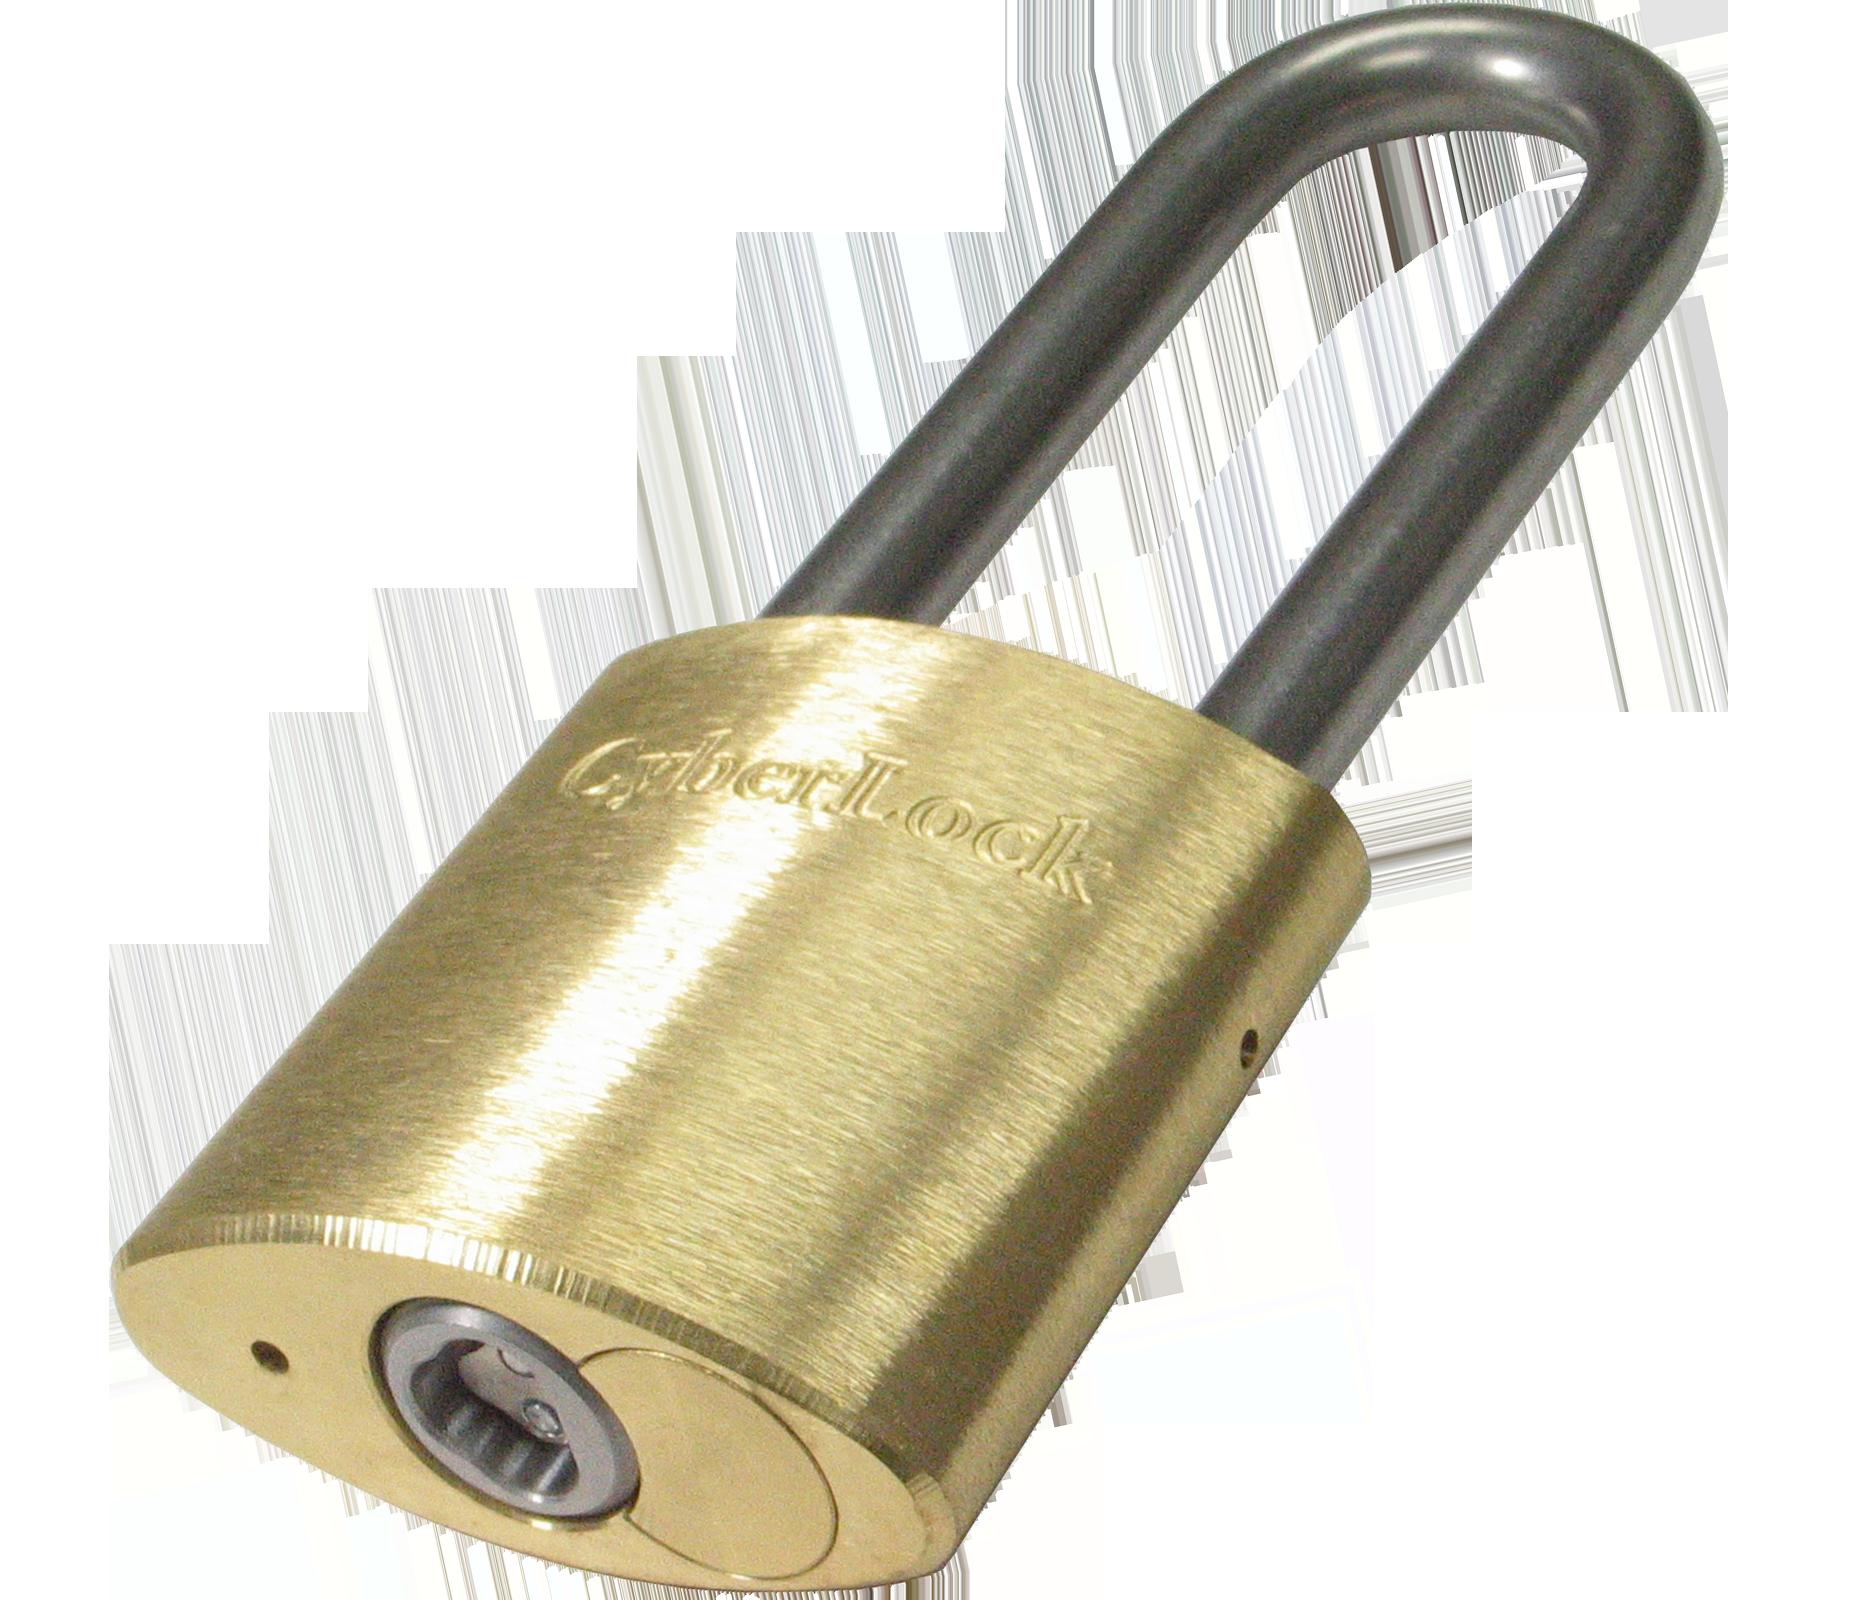 CyberLock Brass Padlock